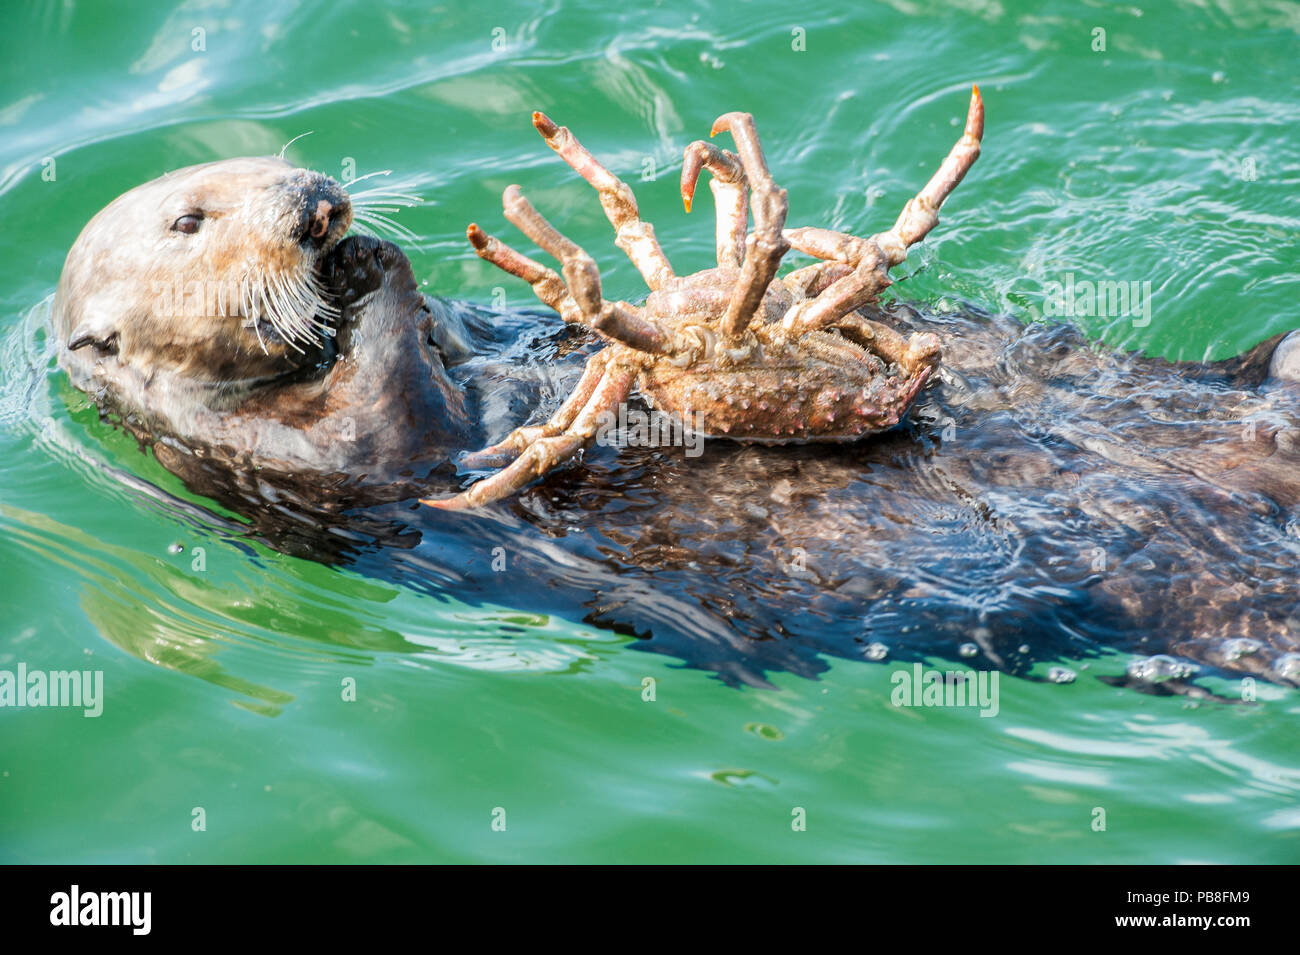 California sea otter (Enhydra lutris) feeding on Northern kelp crab, Monterey Bay, California, USA, Eastern Pacific Ocean, May - Stock Image